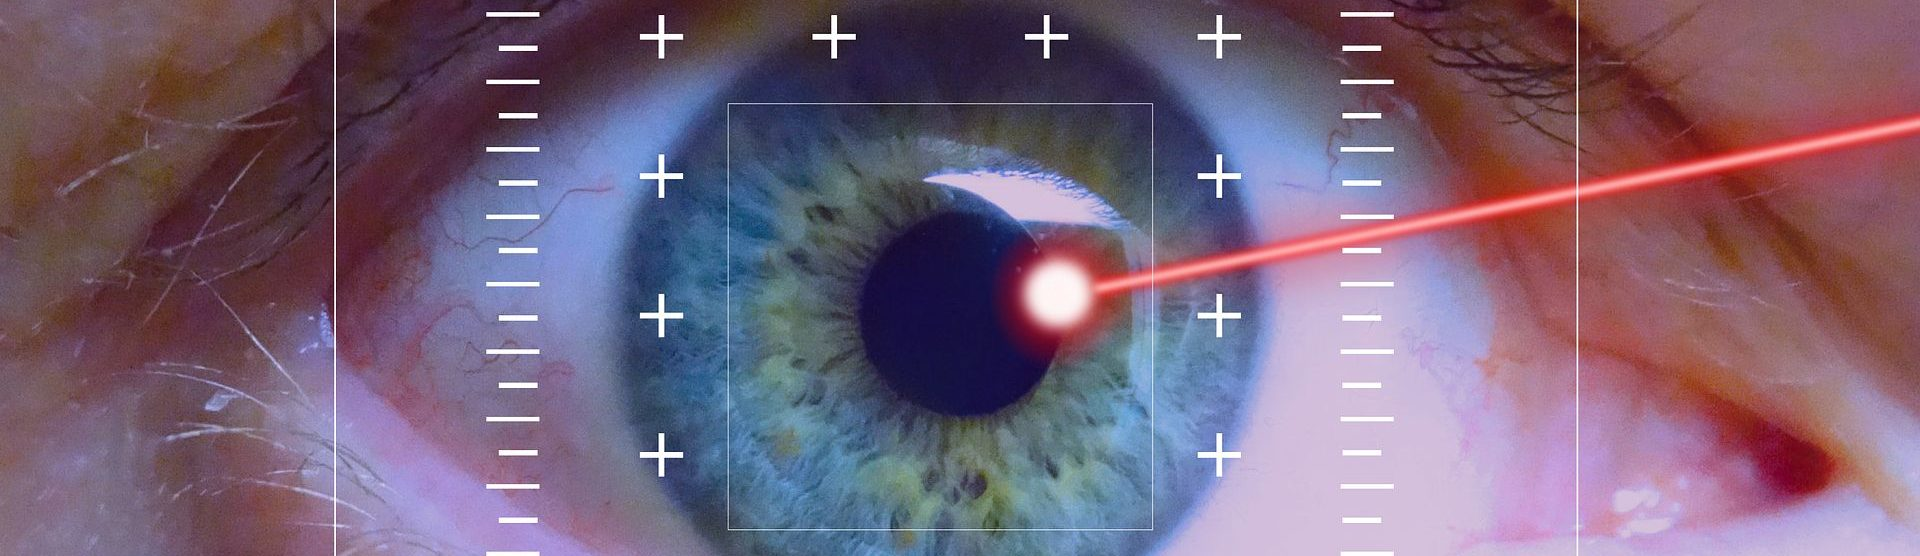 Методы лечения глаукомы